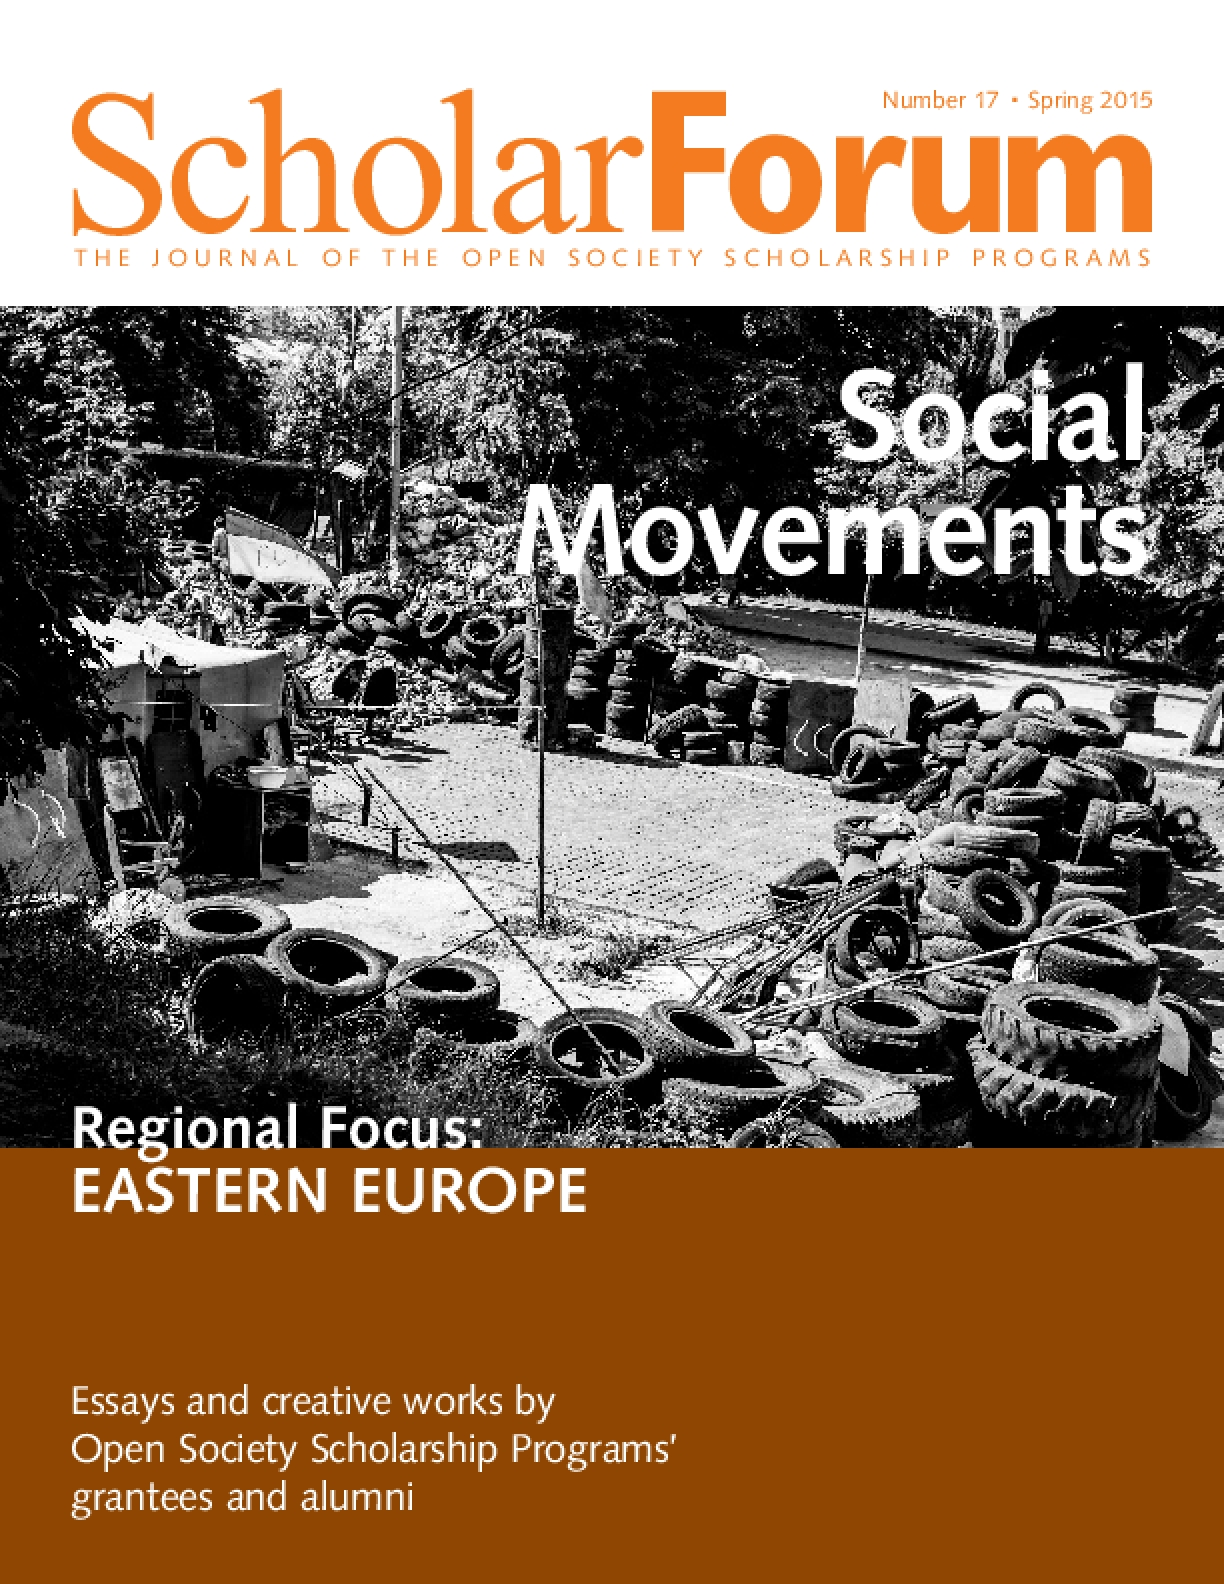 ScholarForum: Social Movements/Eastern Europe